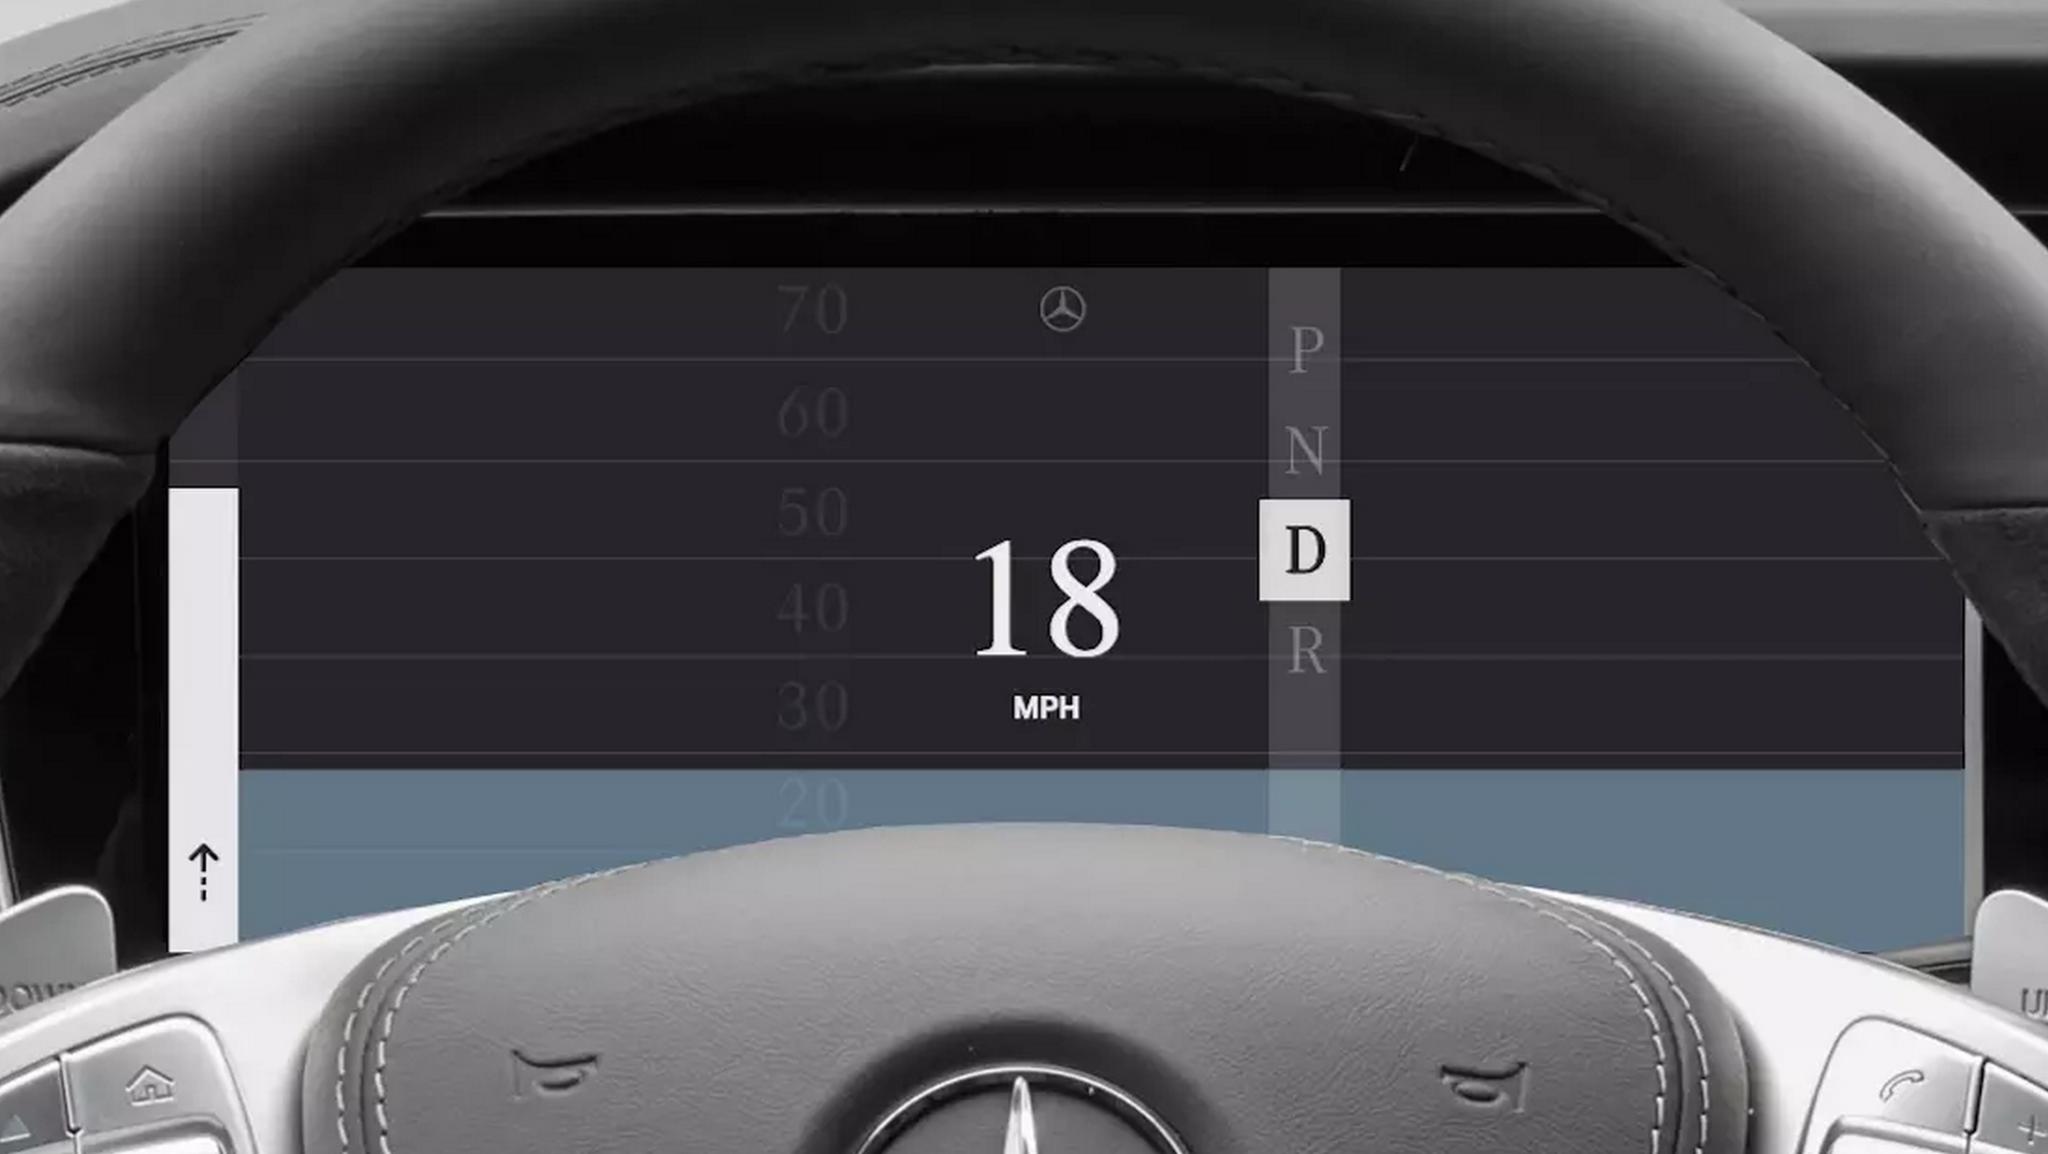 The 'Monument Valley' Designers Reimagine Your Car's Speedometer